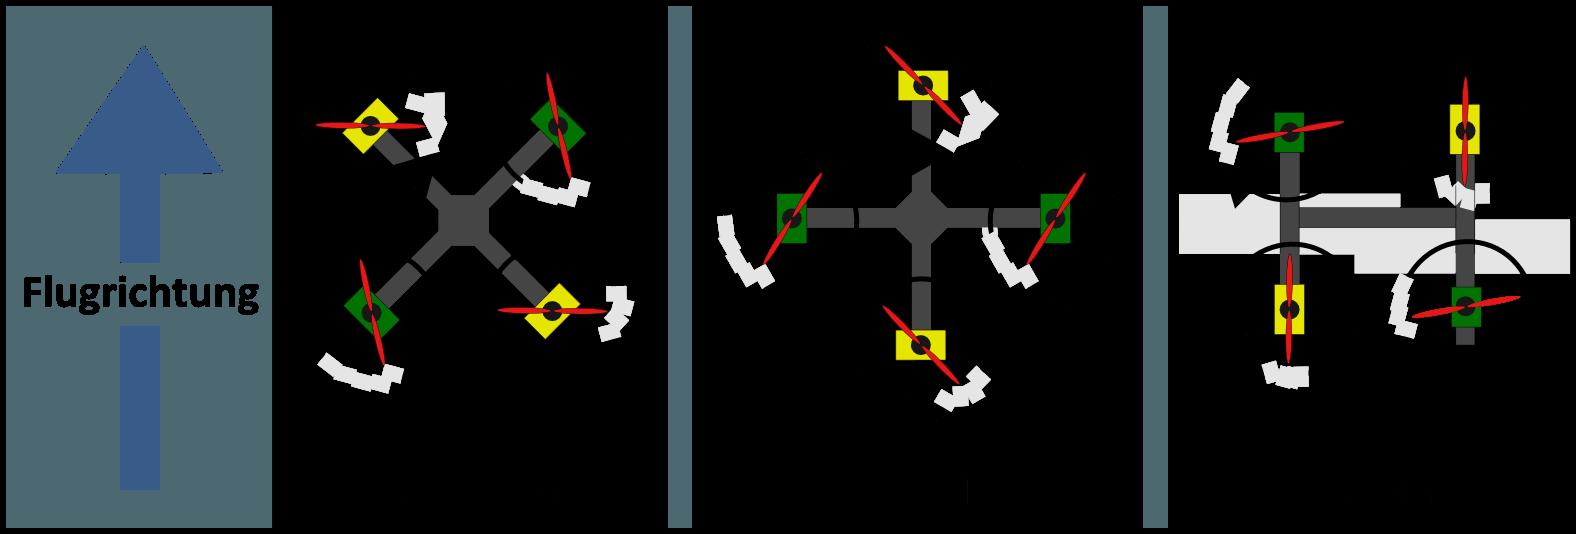 Quadrocopter kaufen - Ausrichtung